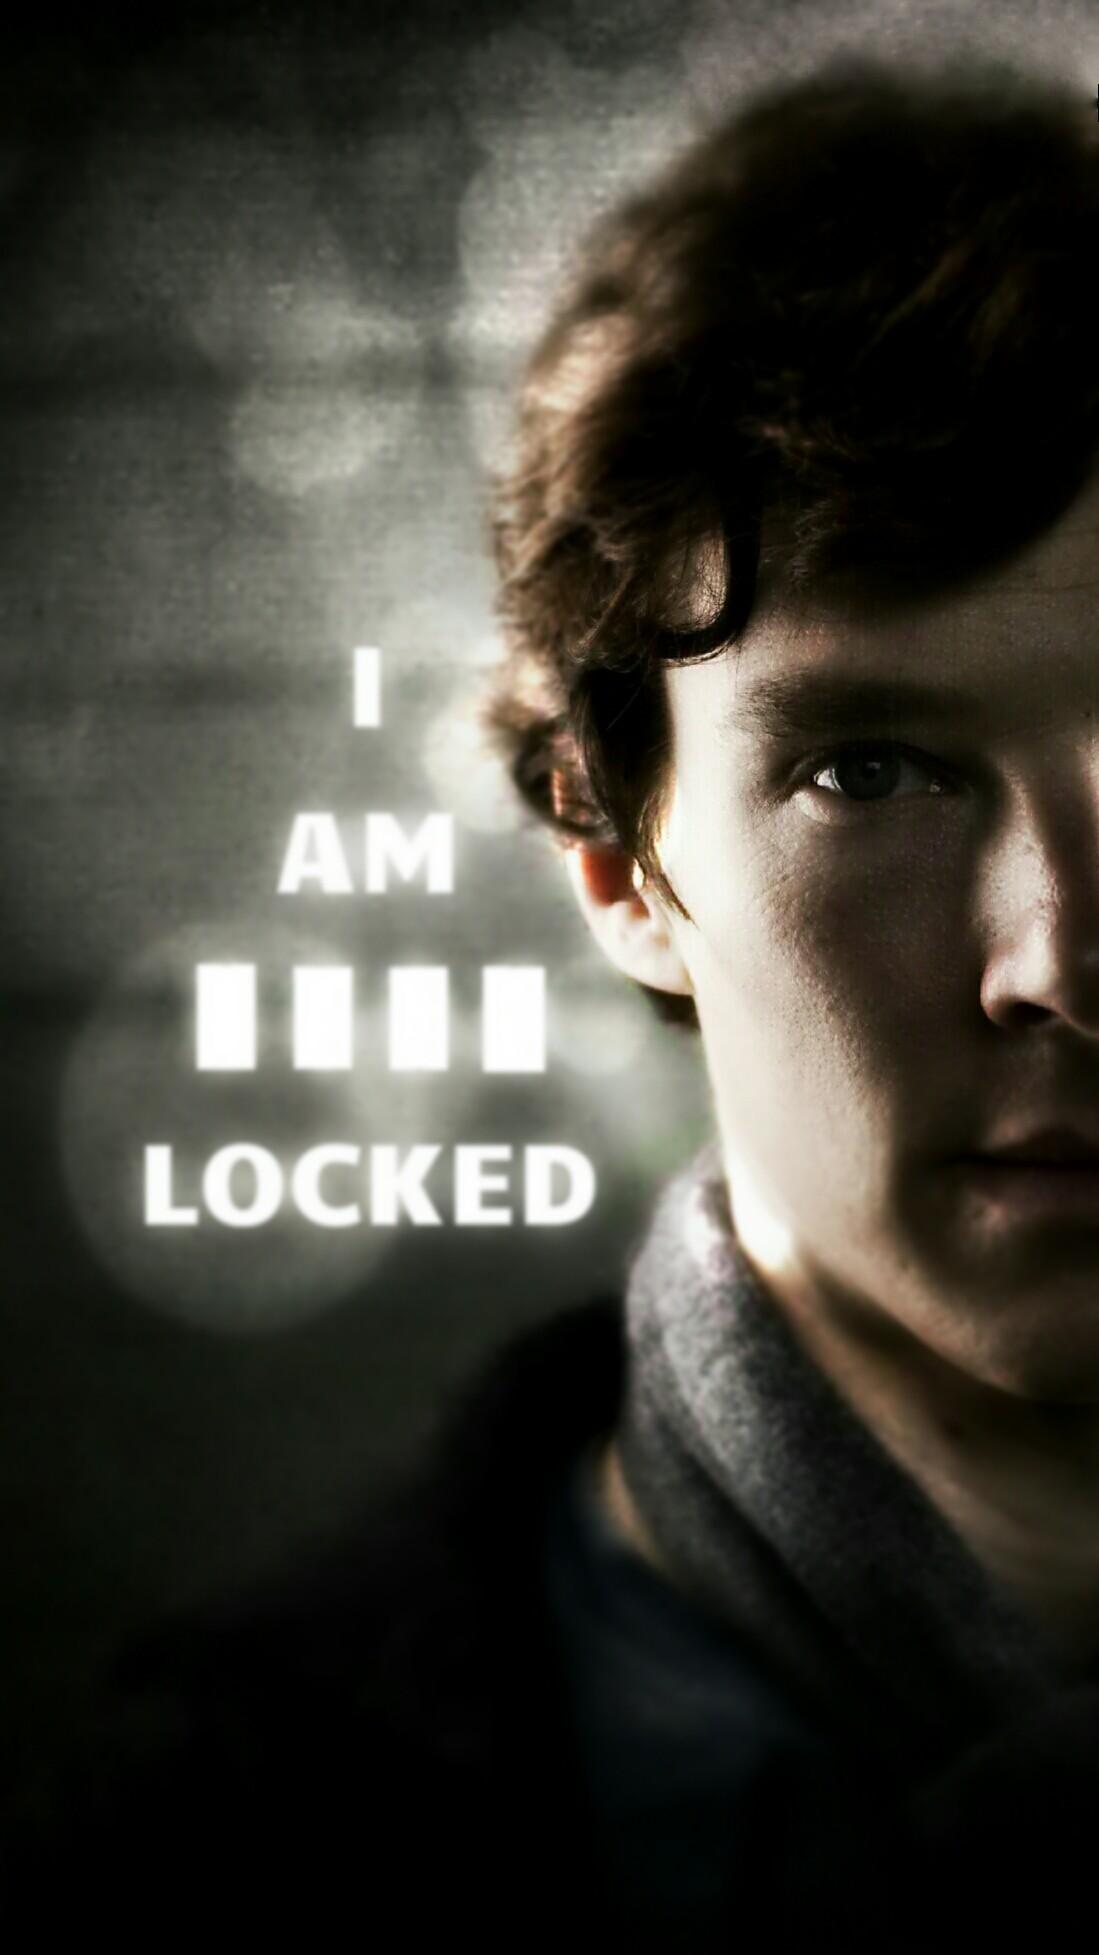 I Am Locked Wallpaper 77 Images